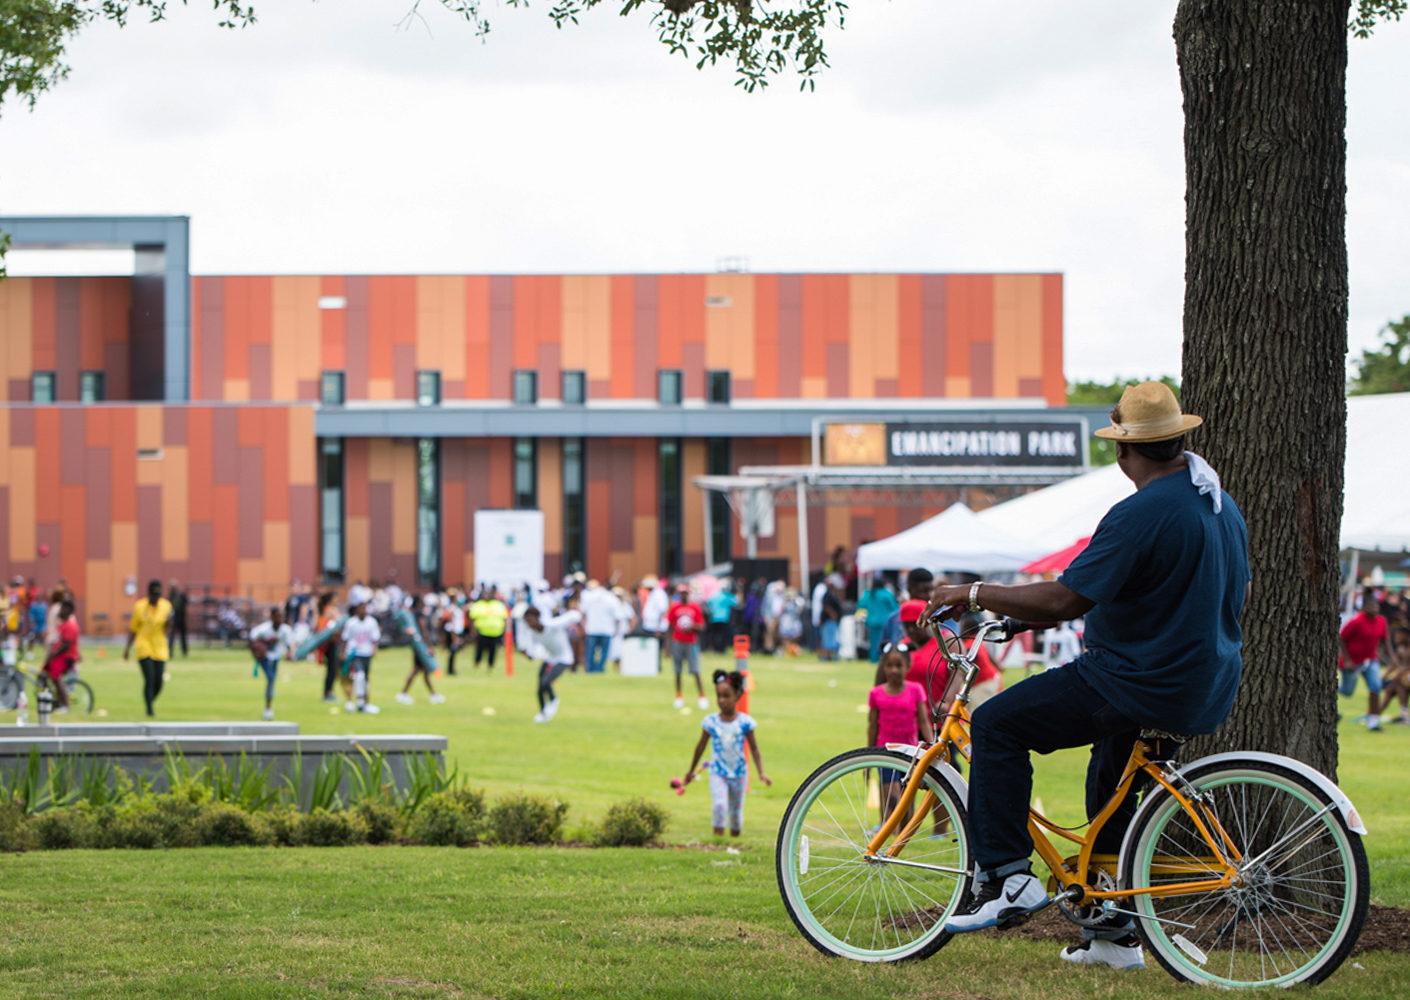 Community Event at Historic Emancipation Park